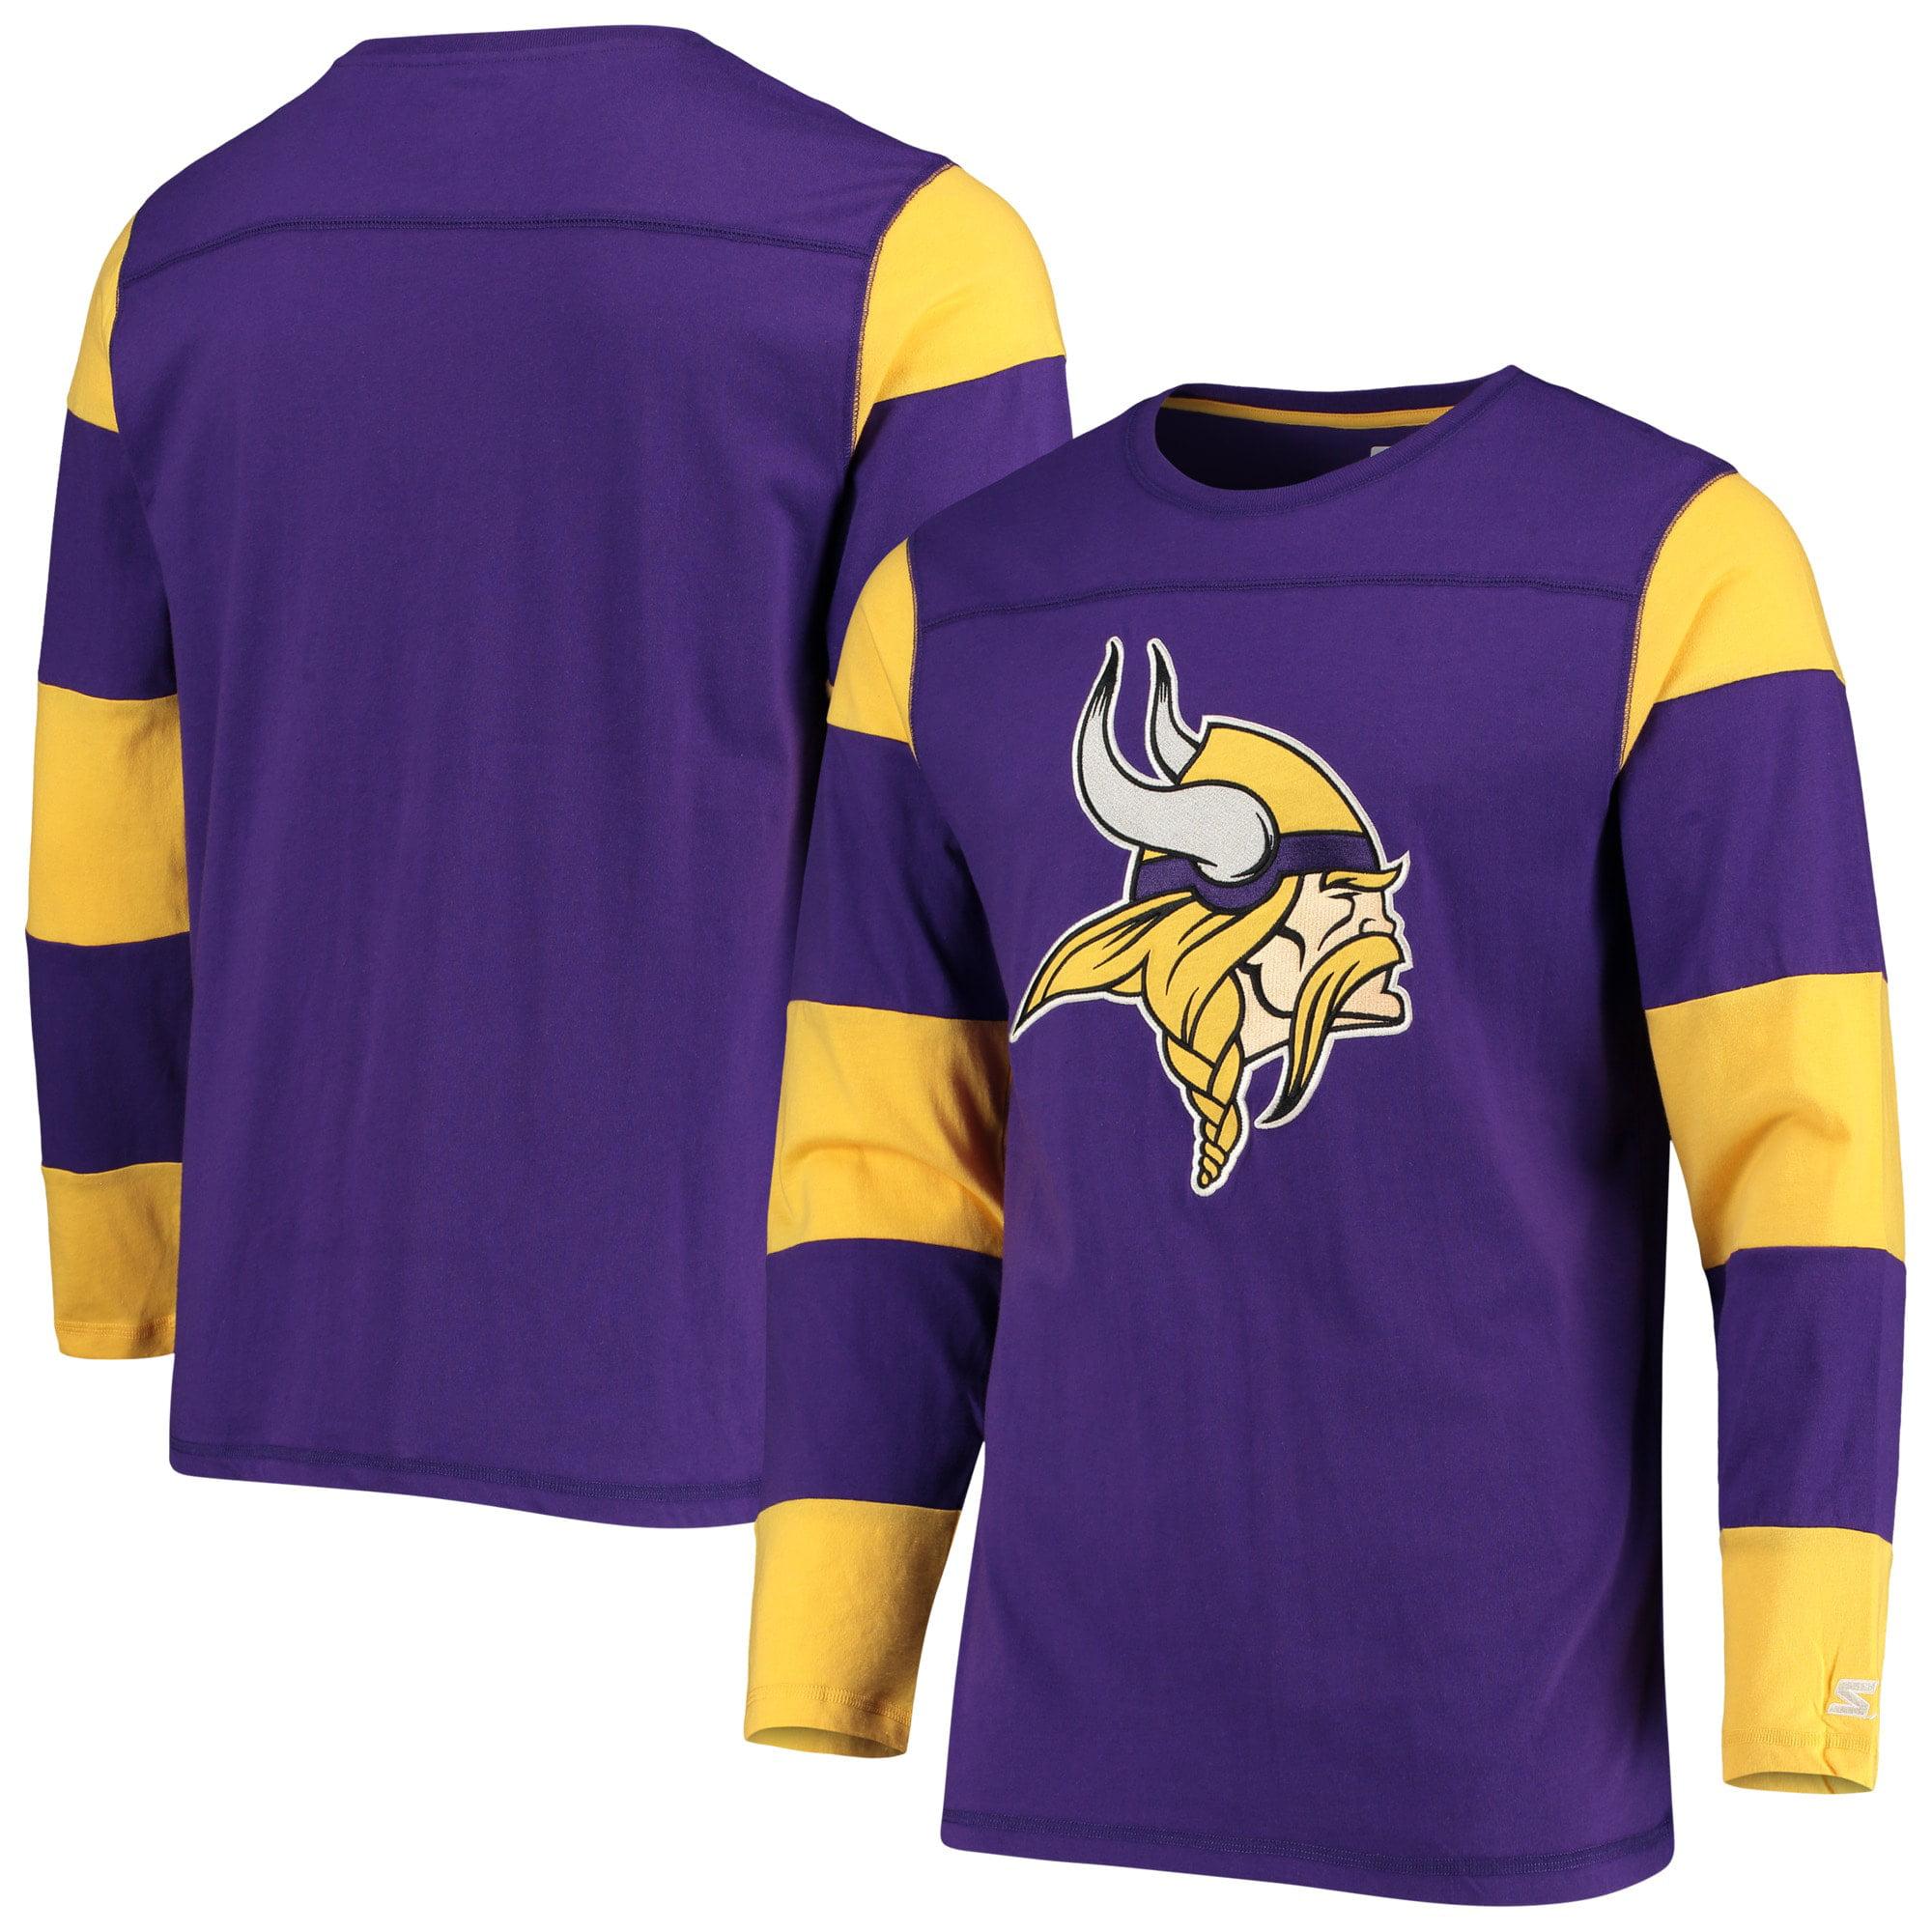 Minnesota Vikings Starter Field Jersey Long Sleeve T-Shirt - Purple/Gold - Walmart.com